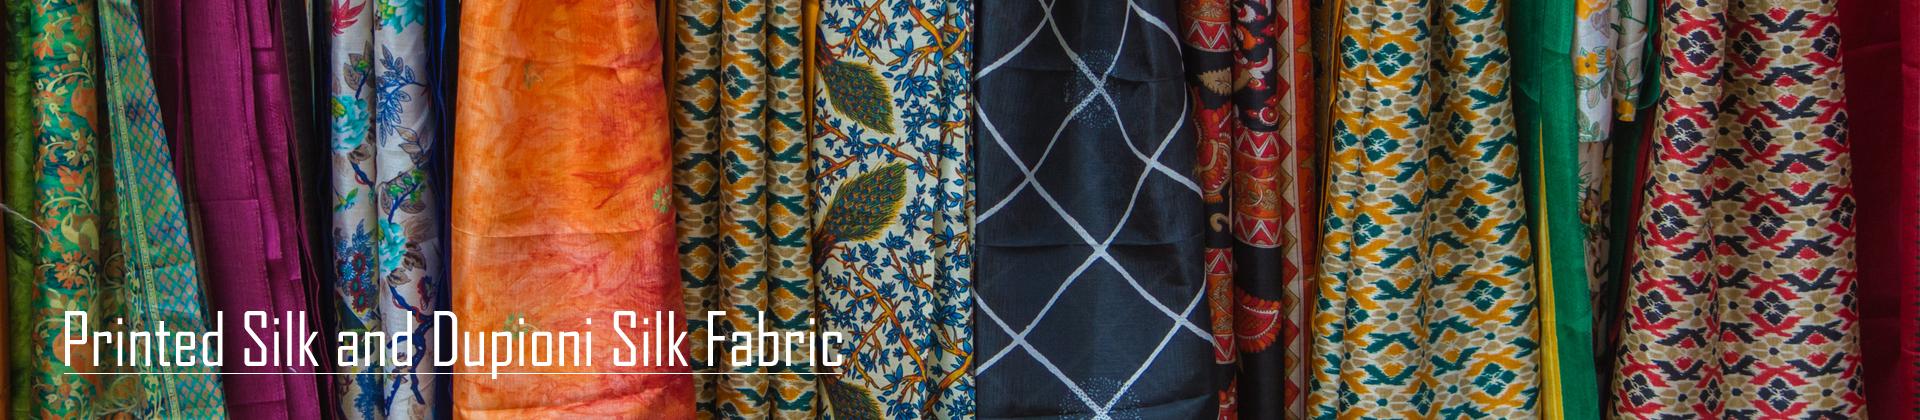 Printed Silk and Dupioni Silk Fabric